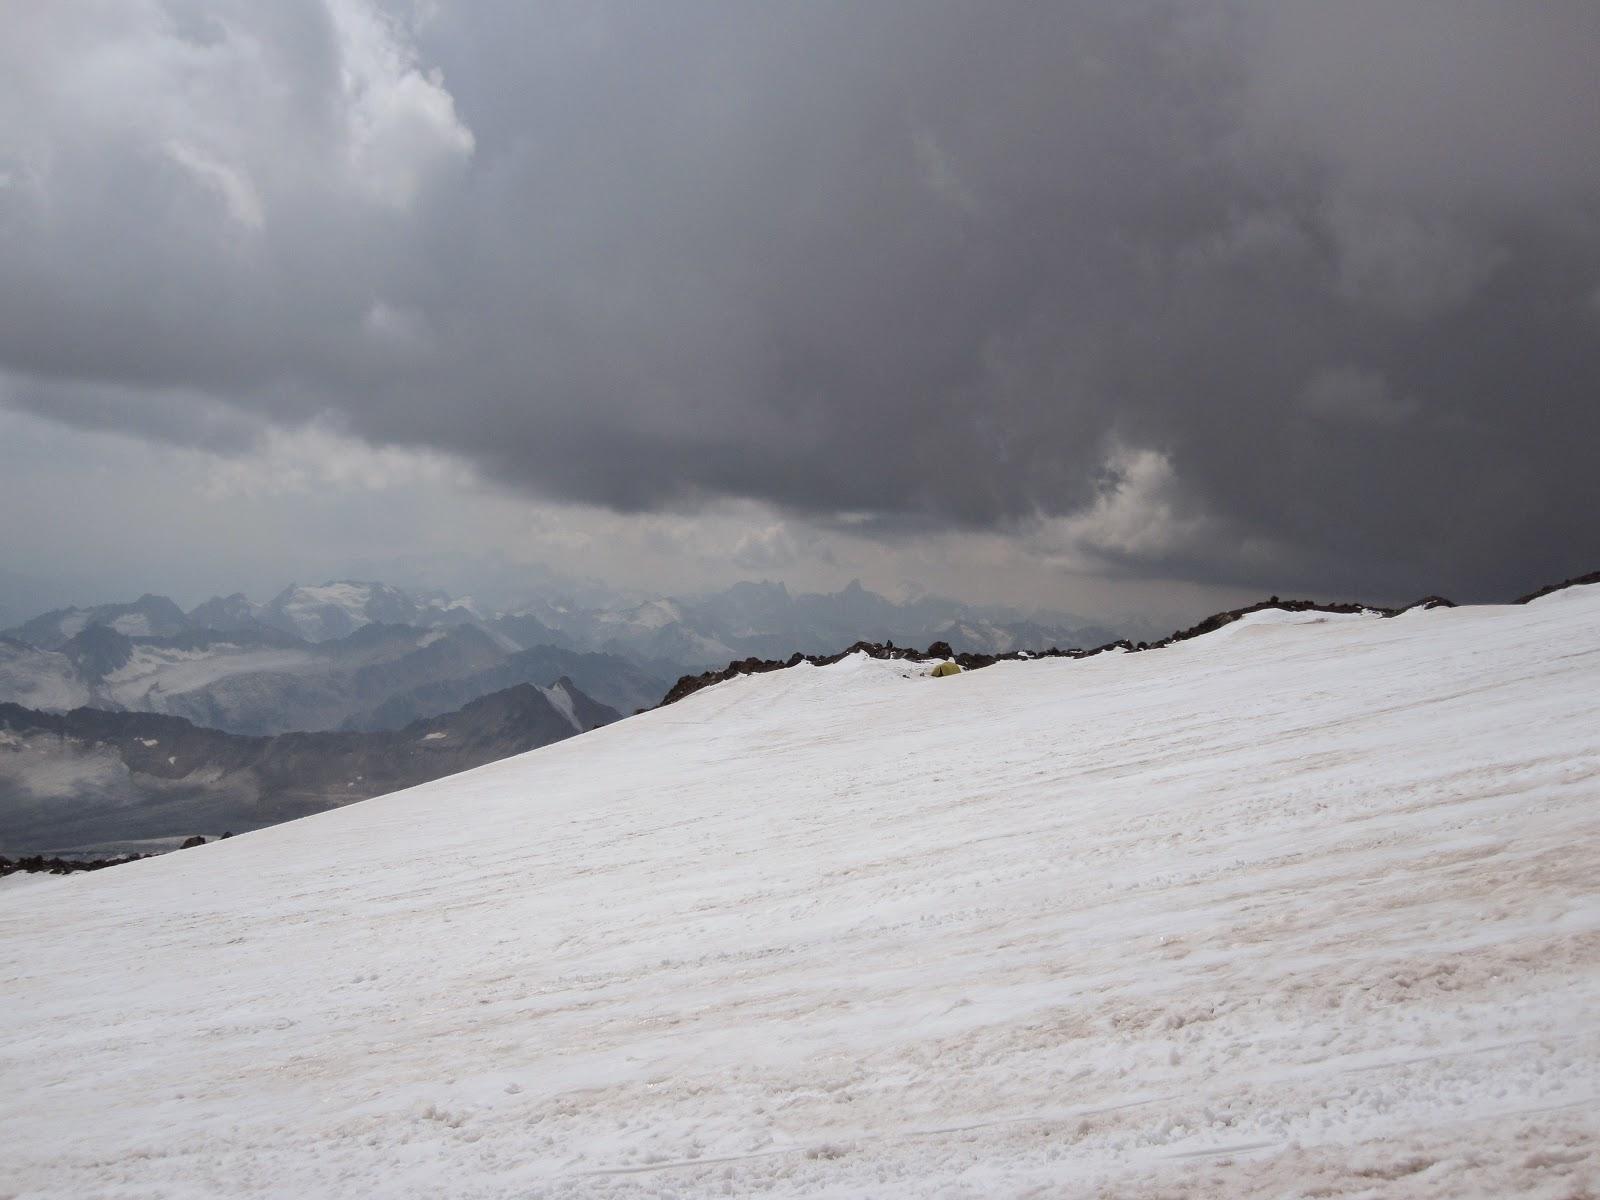 Thunderstorm on Mount Elbrus